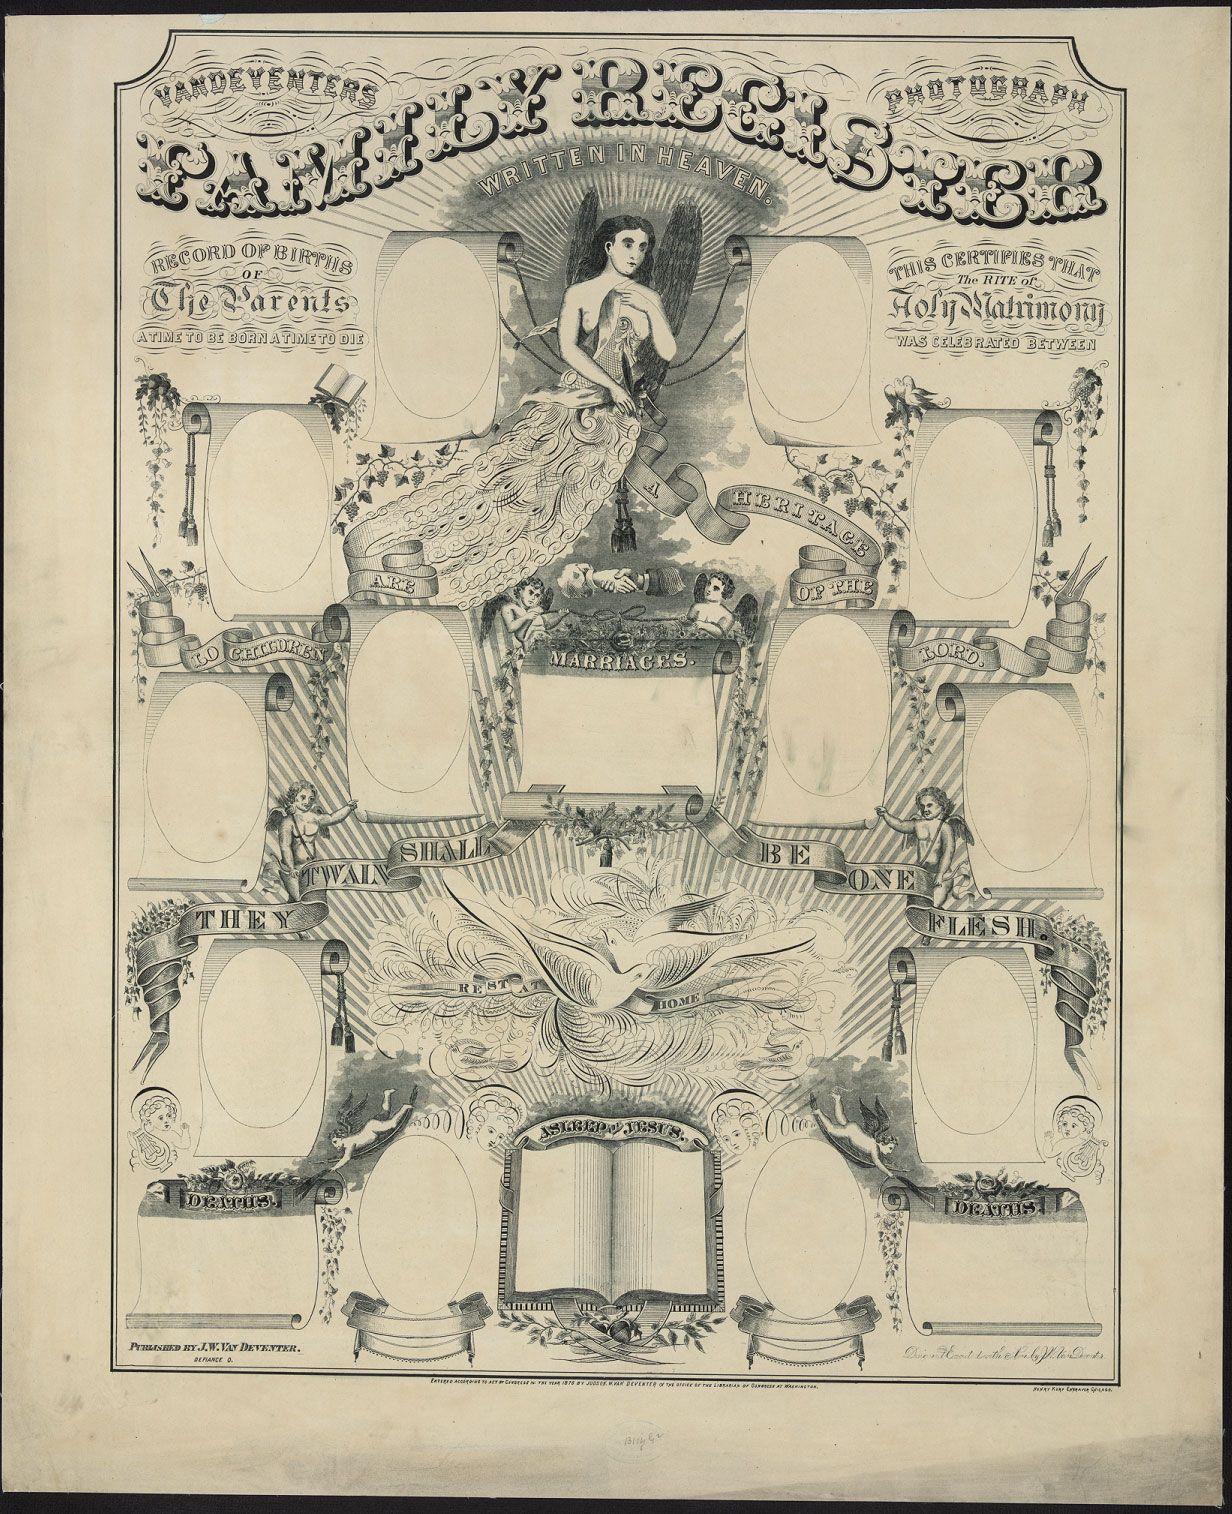 Coleccin De Discos Familias And Genealoga On Pinterest